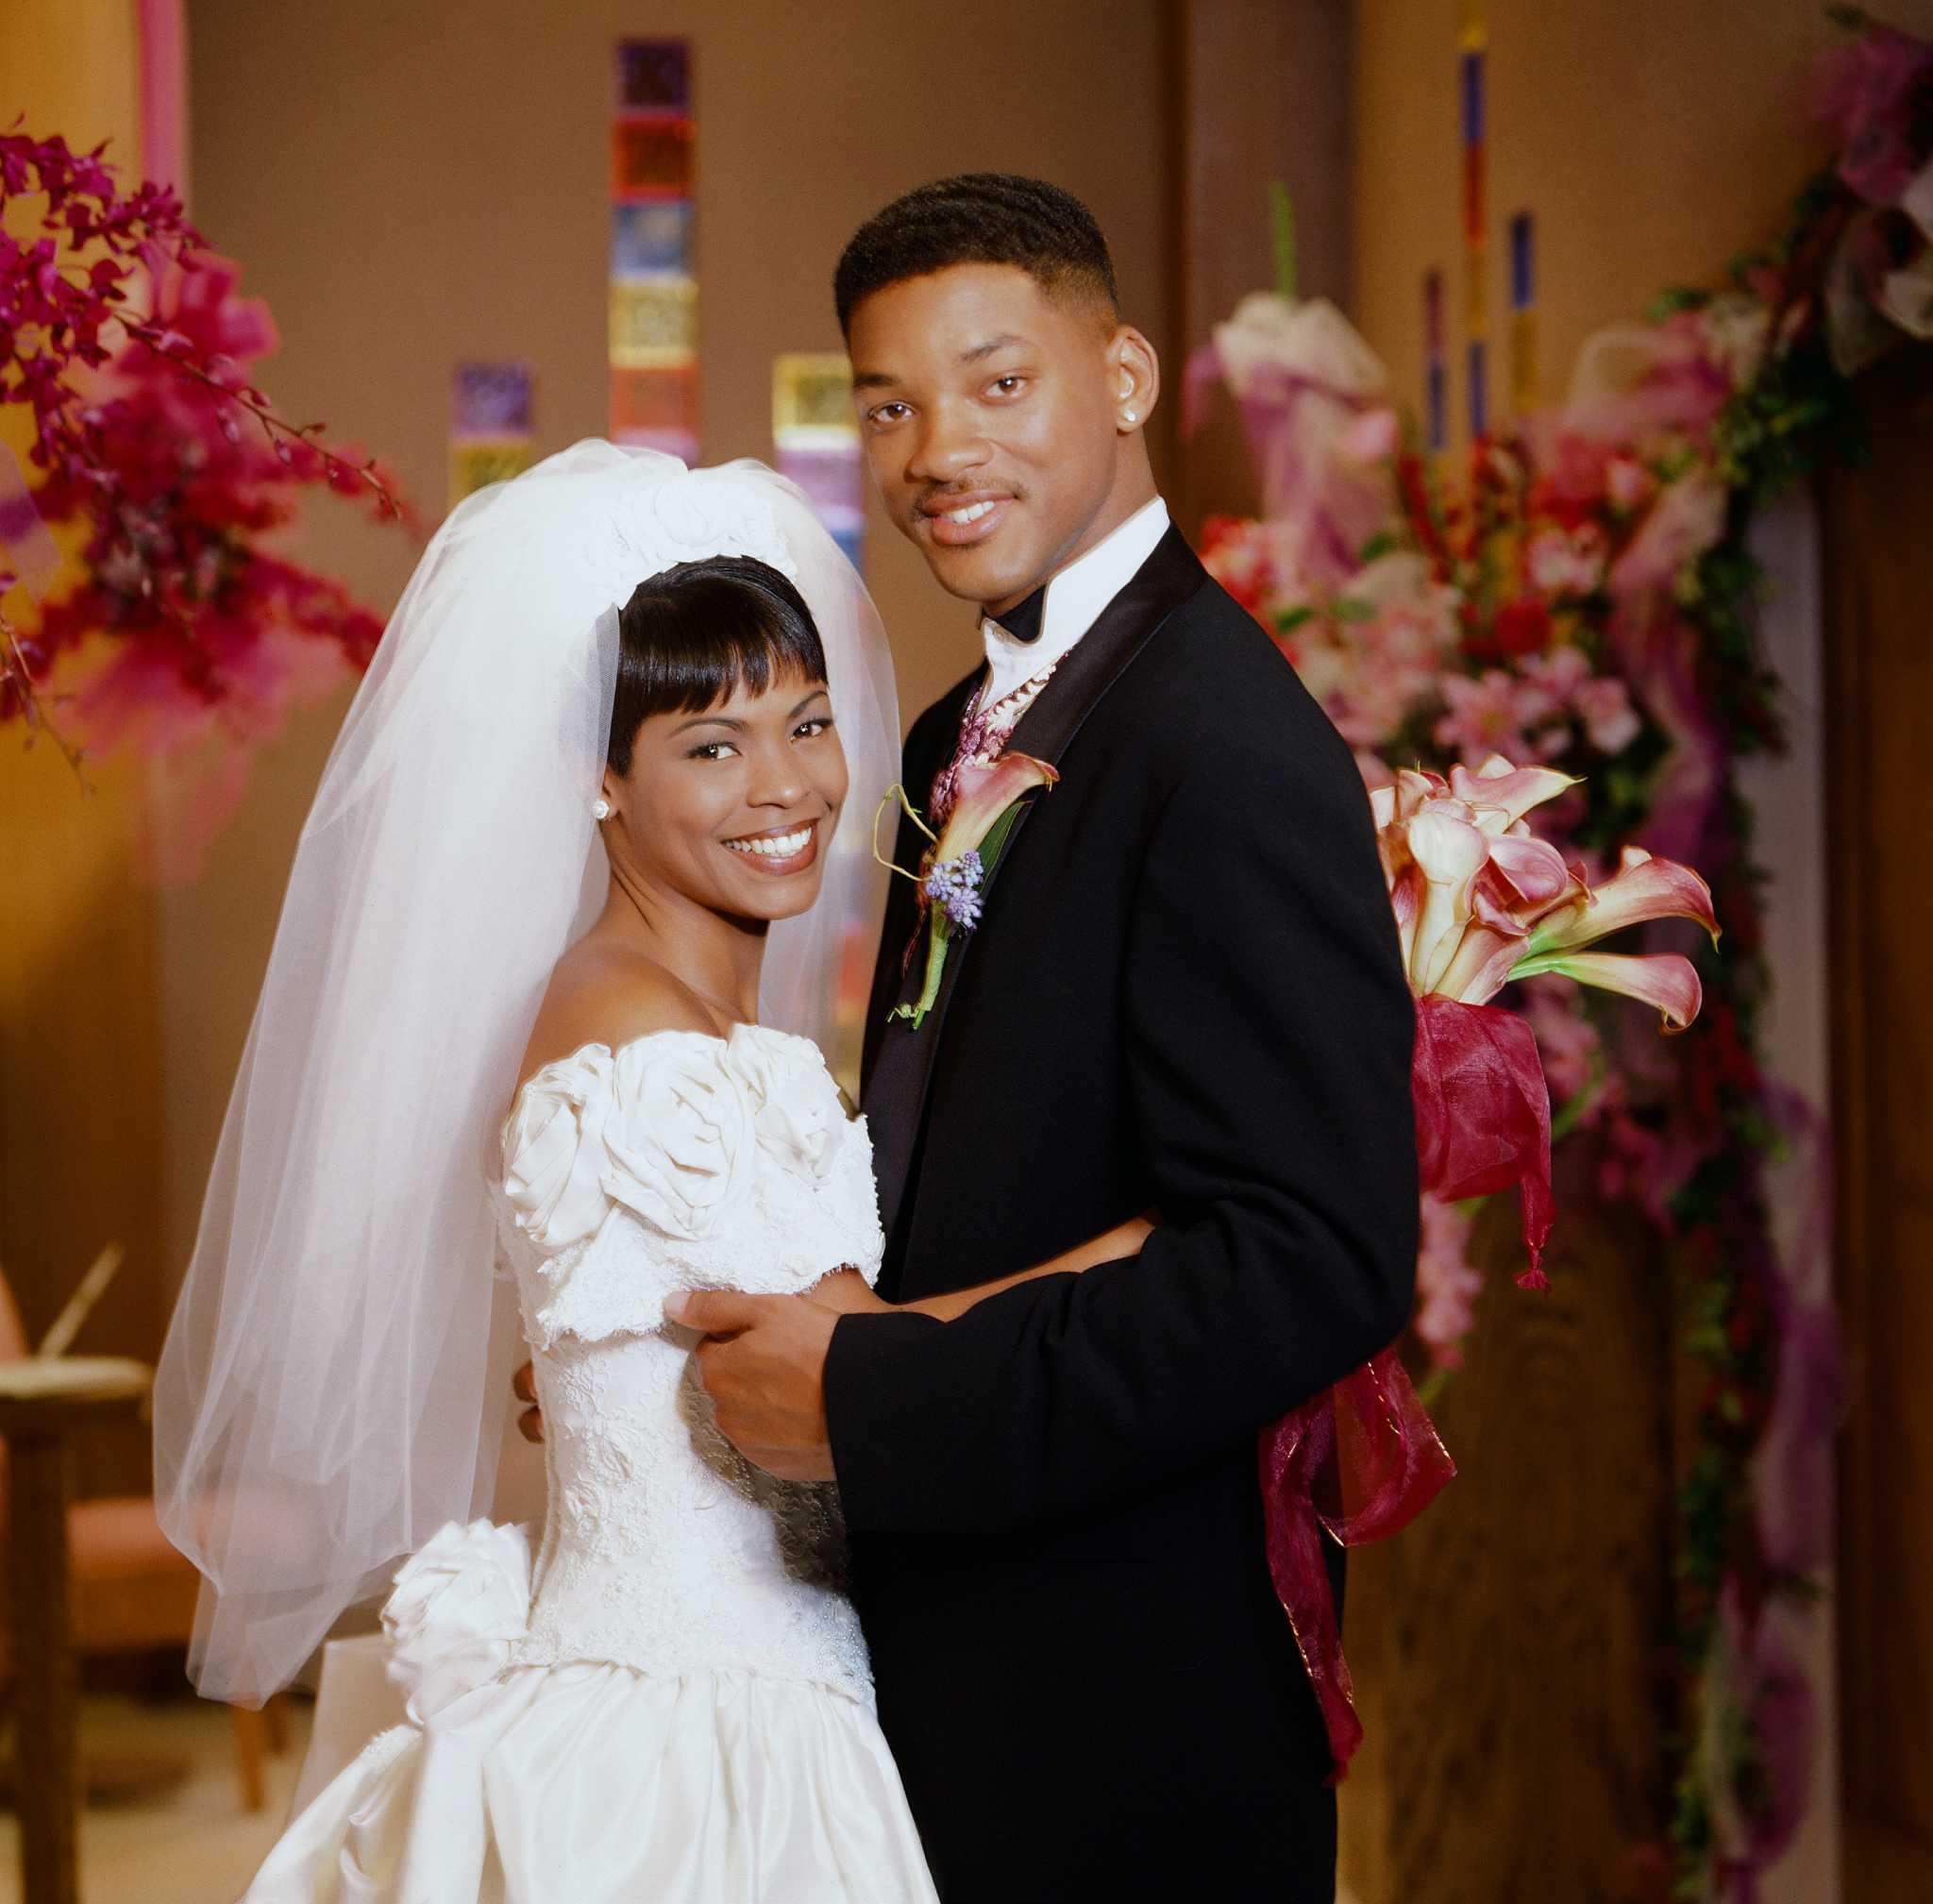 Famous TV weddings - SFGate